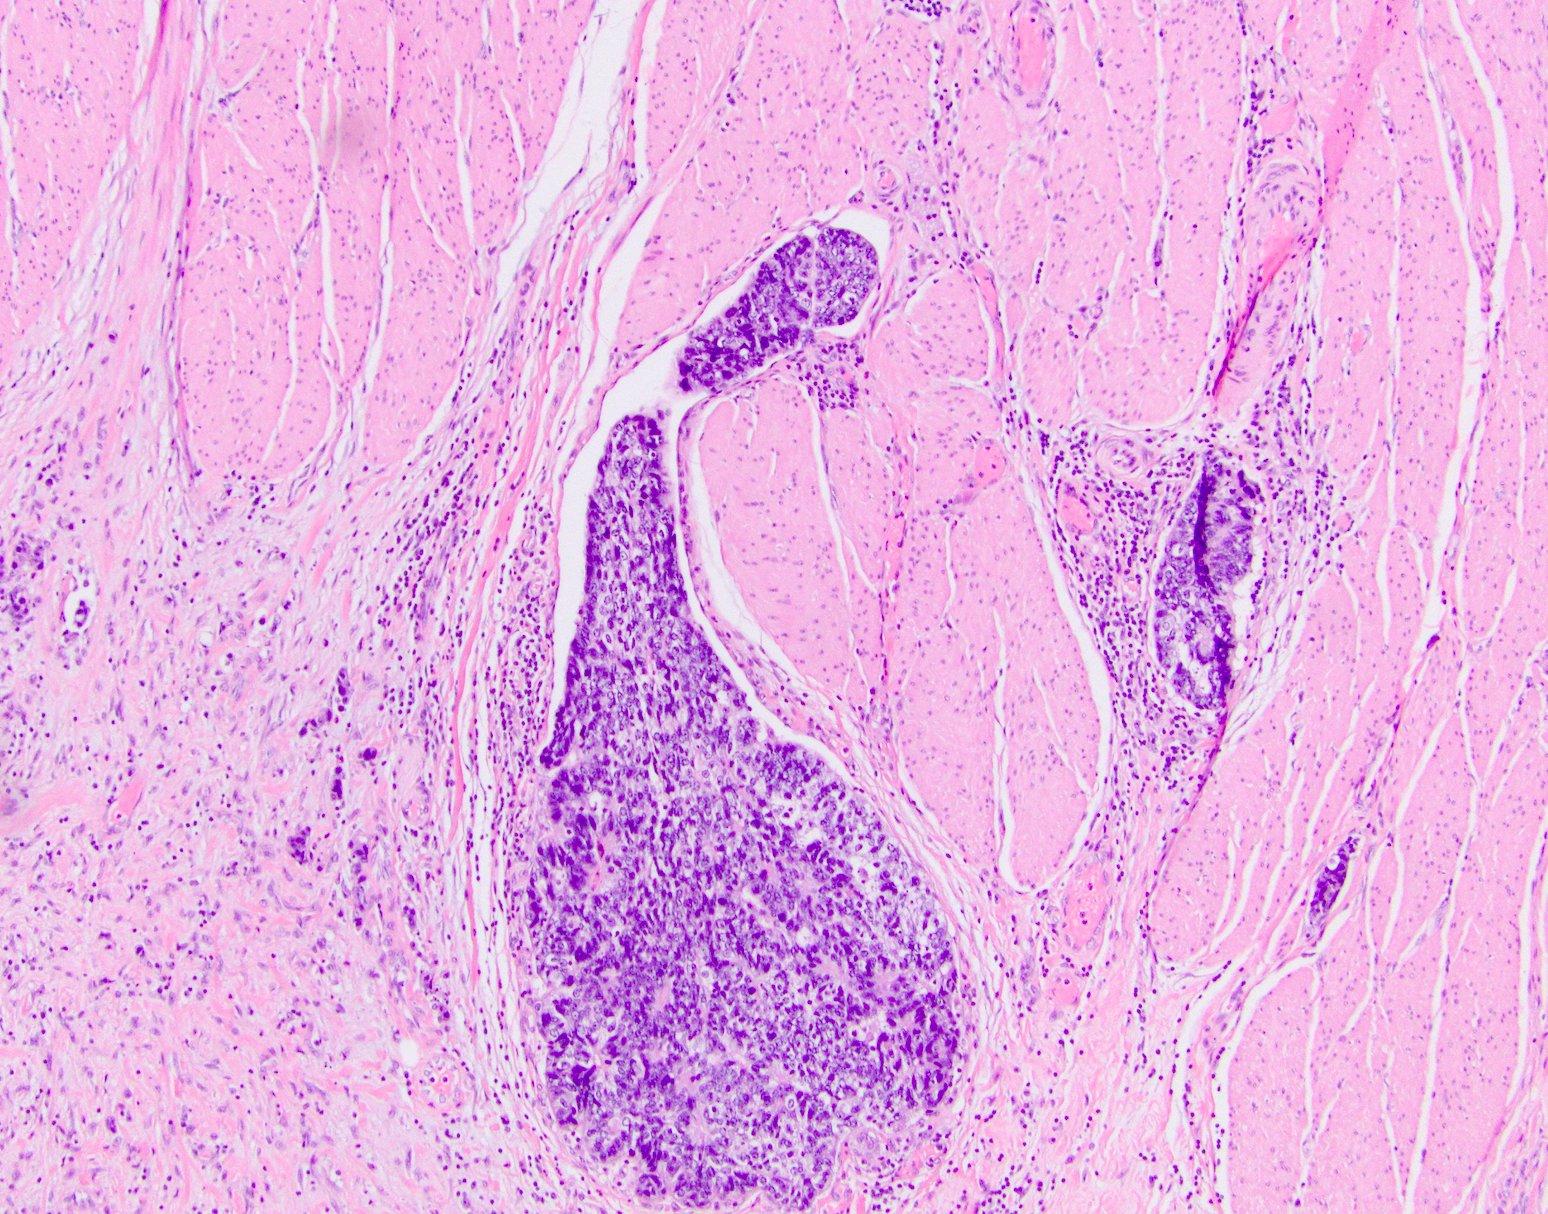 Lymphovascular invasion